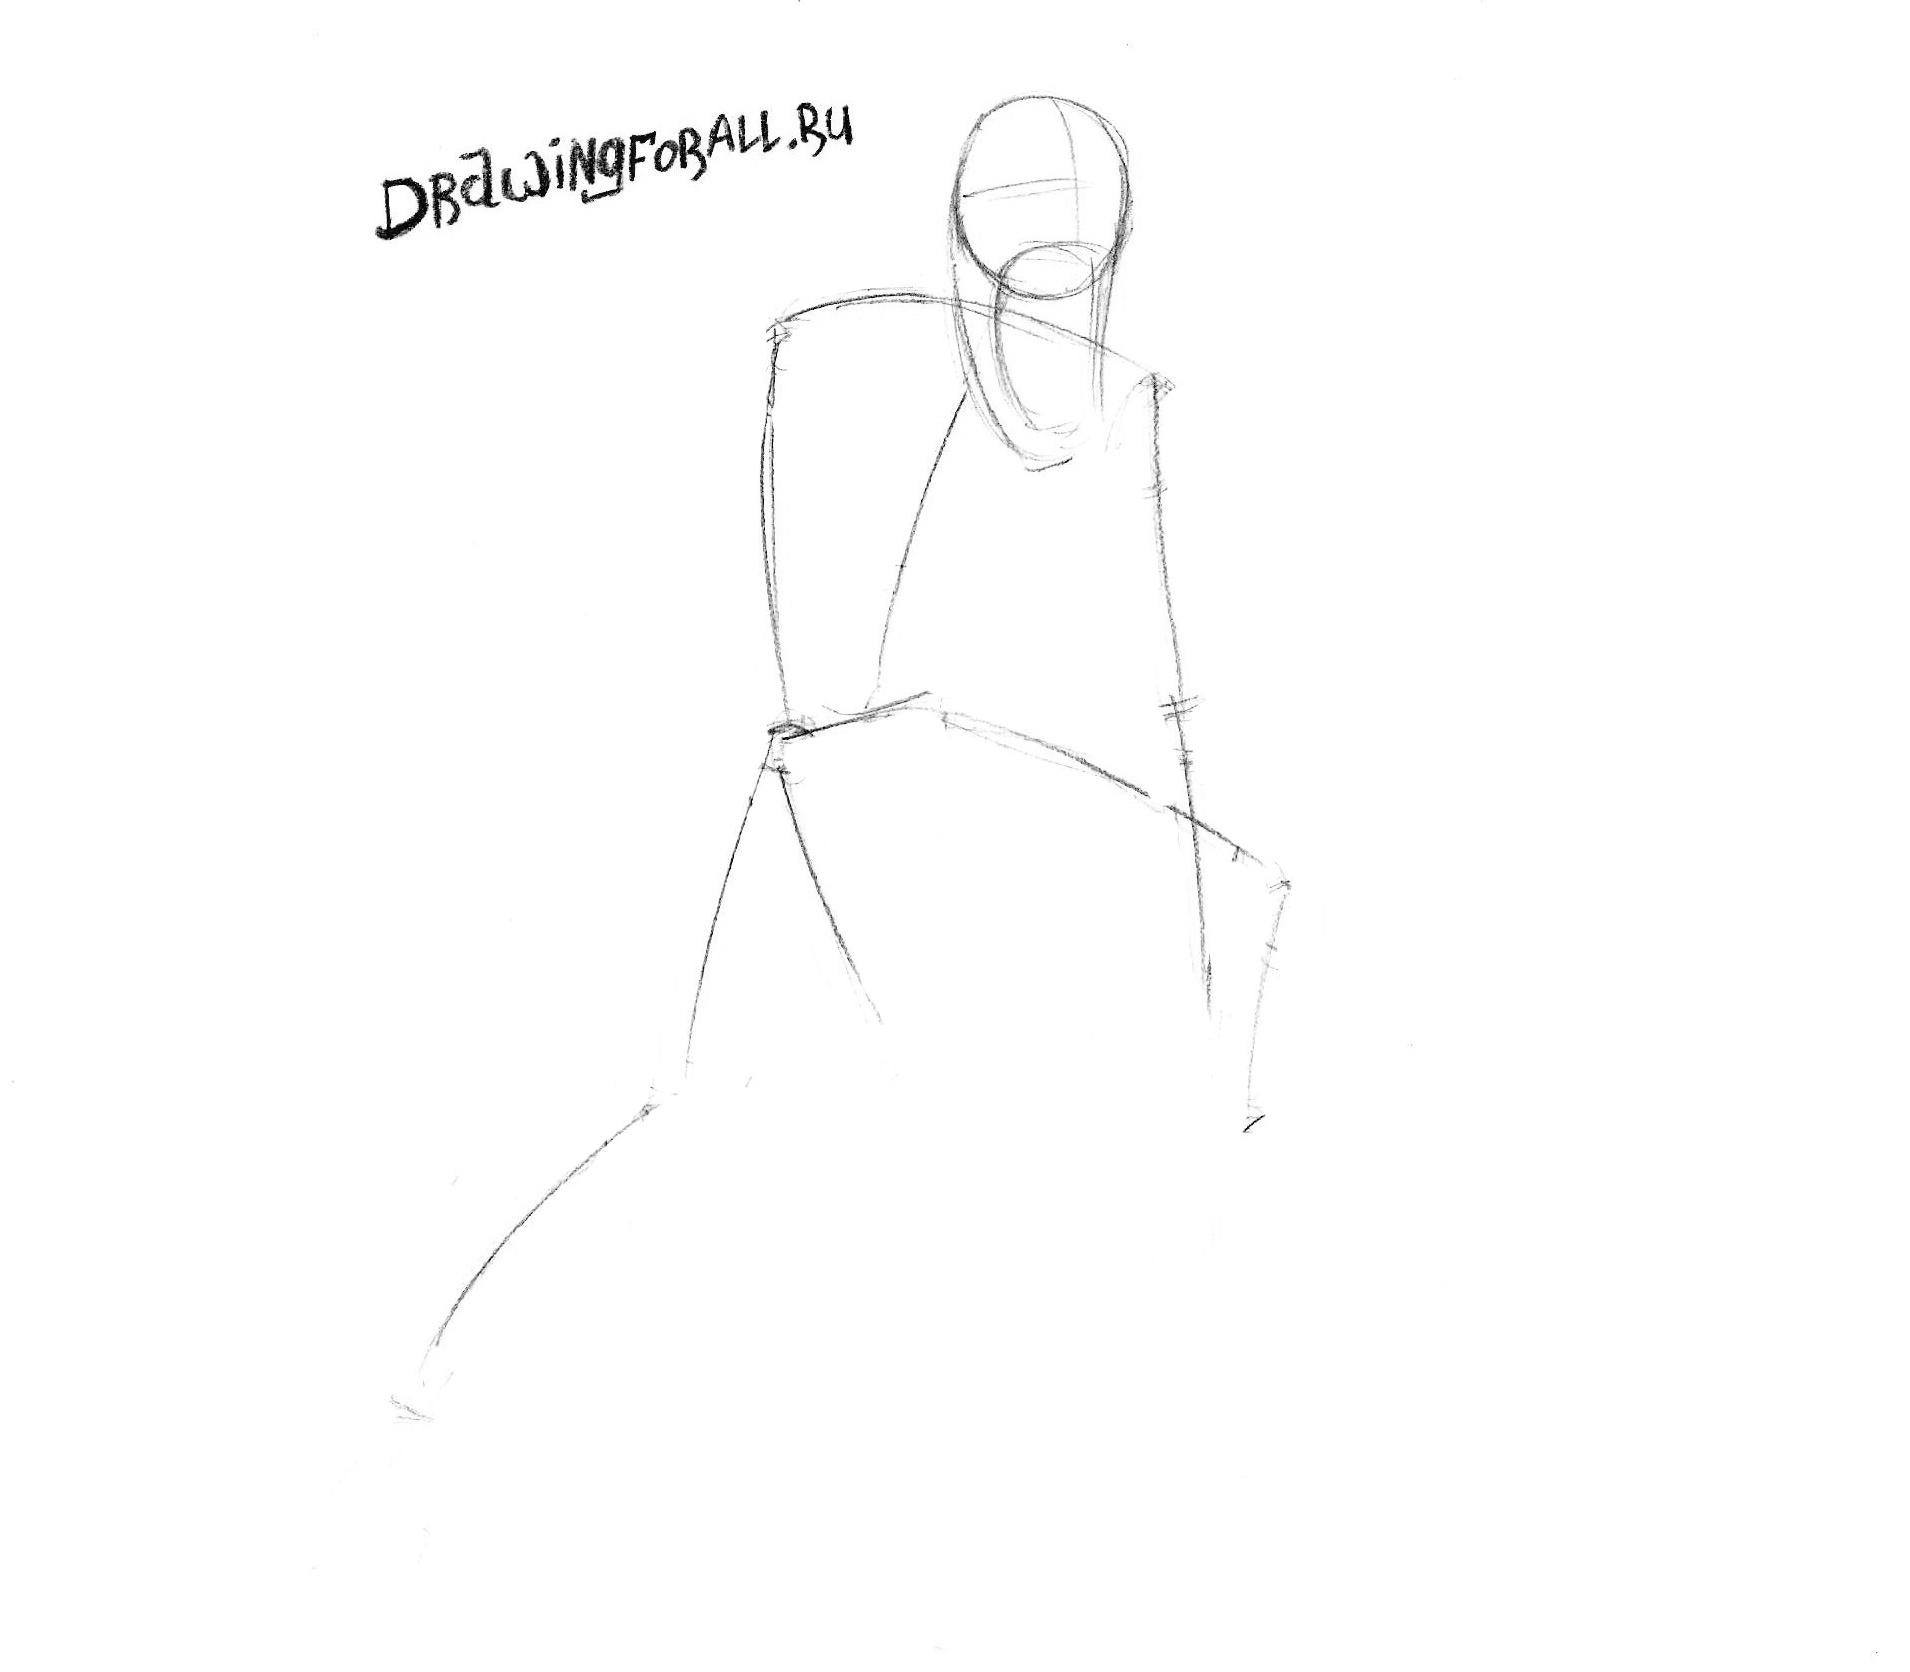 как нарисовать карнажа карандашом